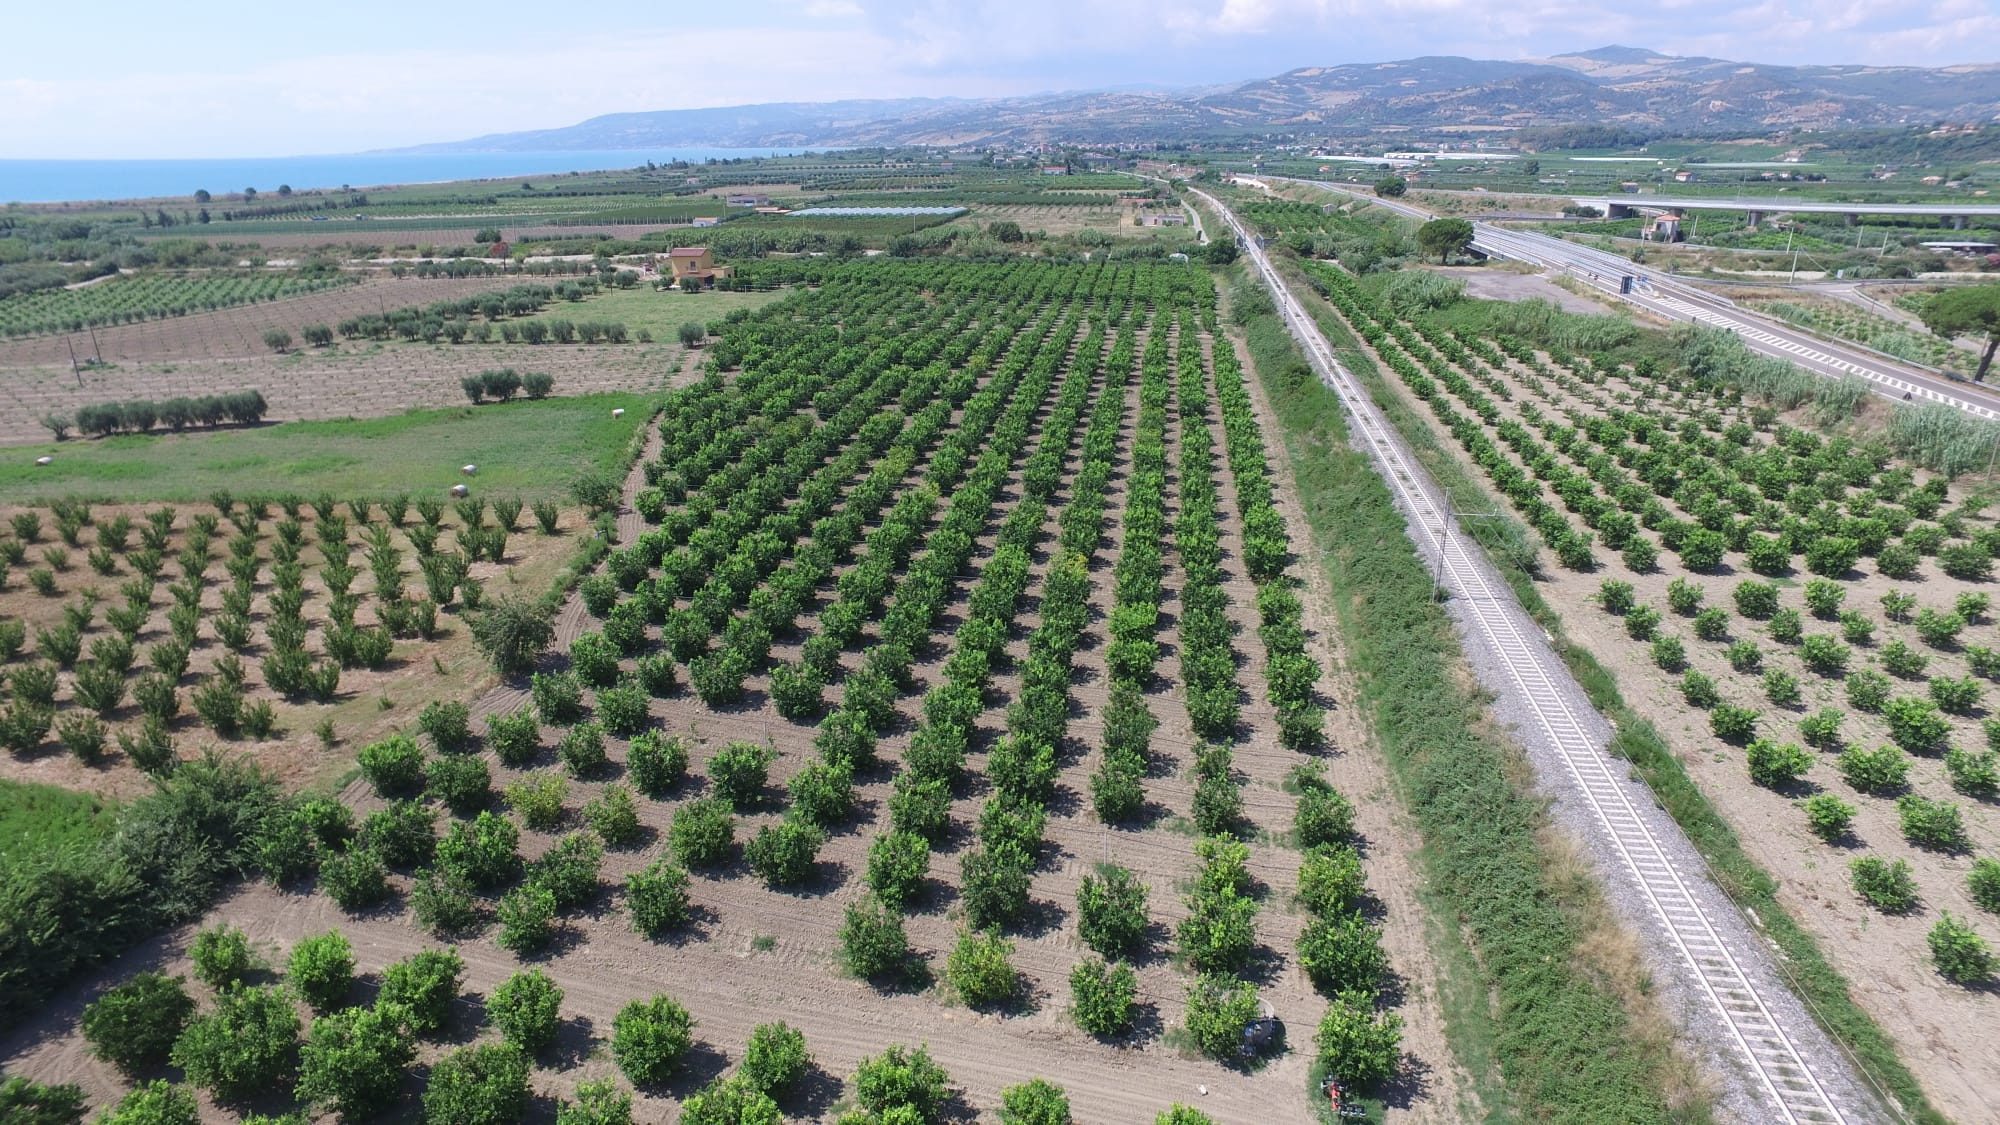 Azienda Agricola di Sprovieri Luca Antonio